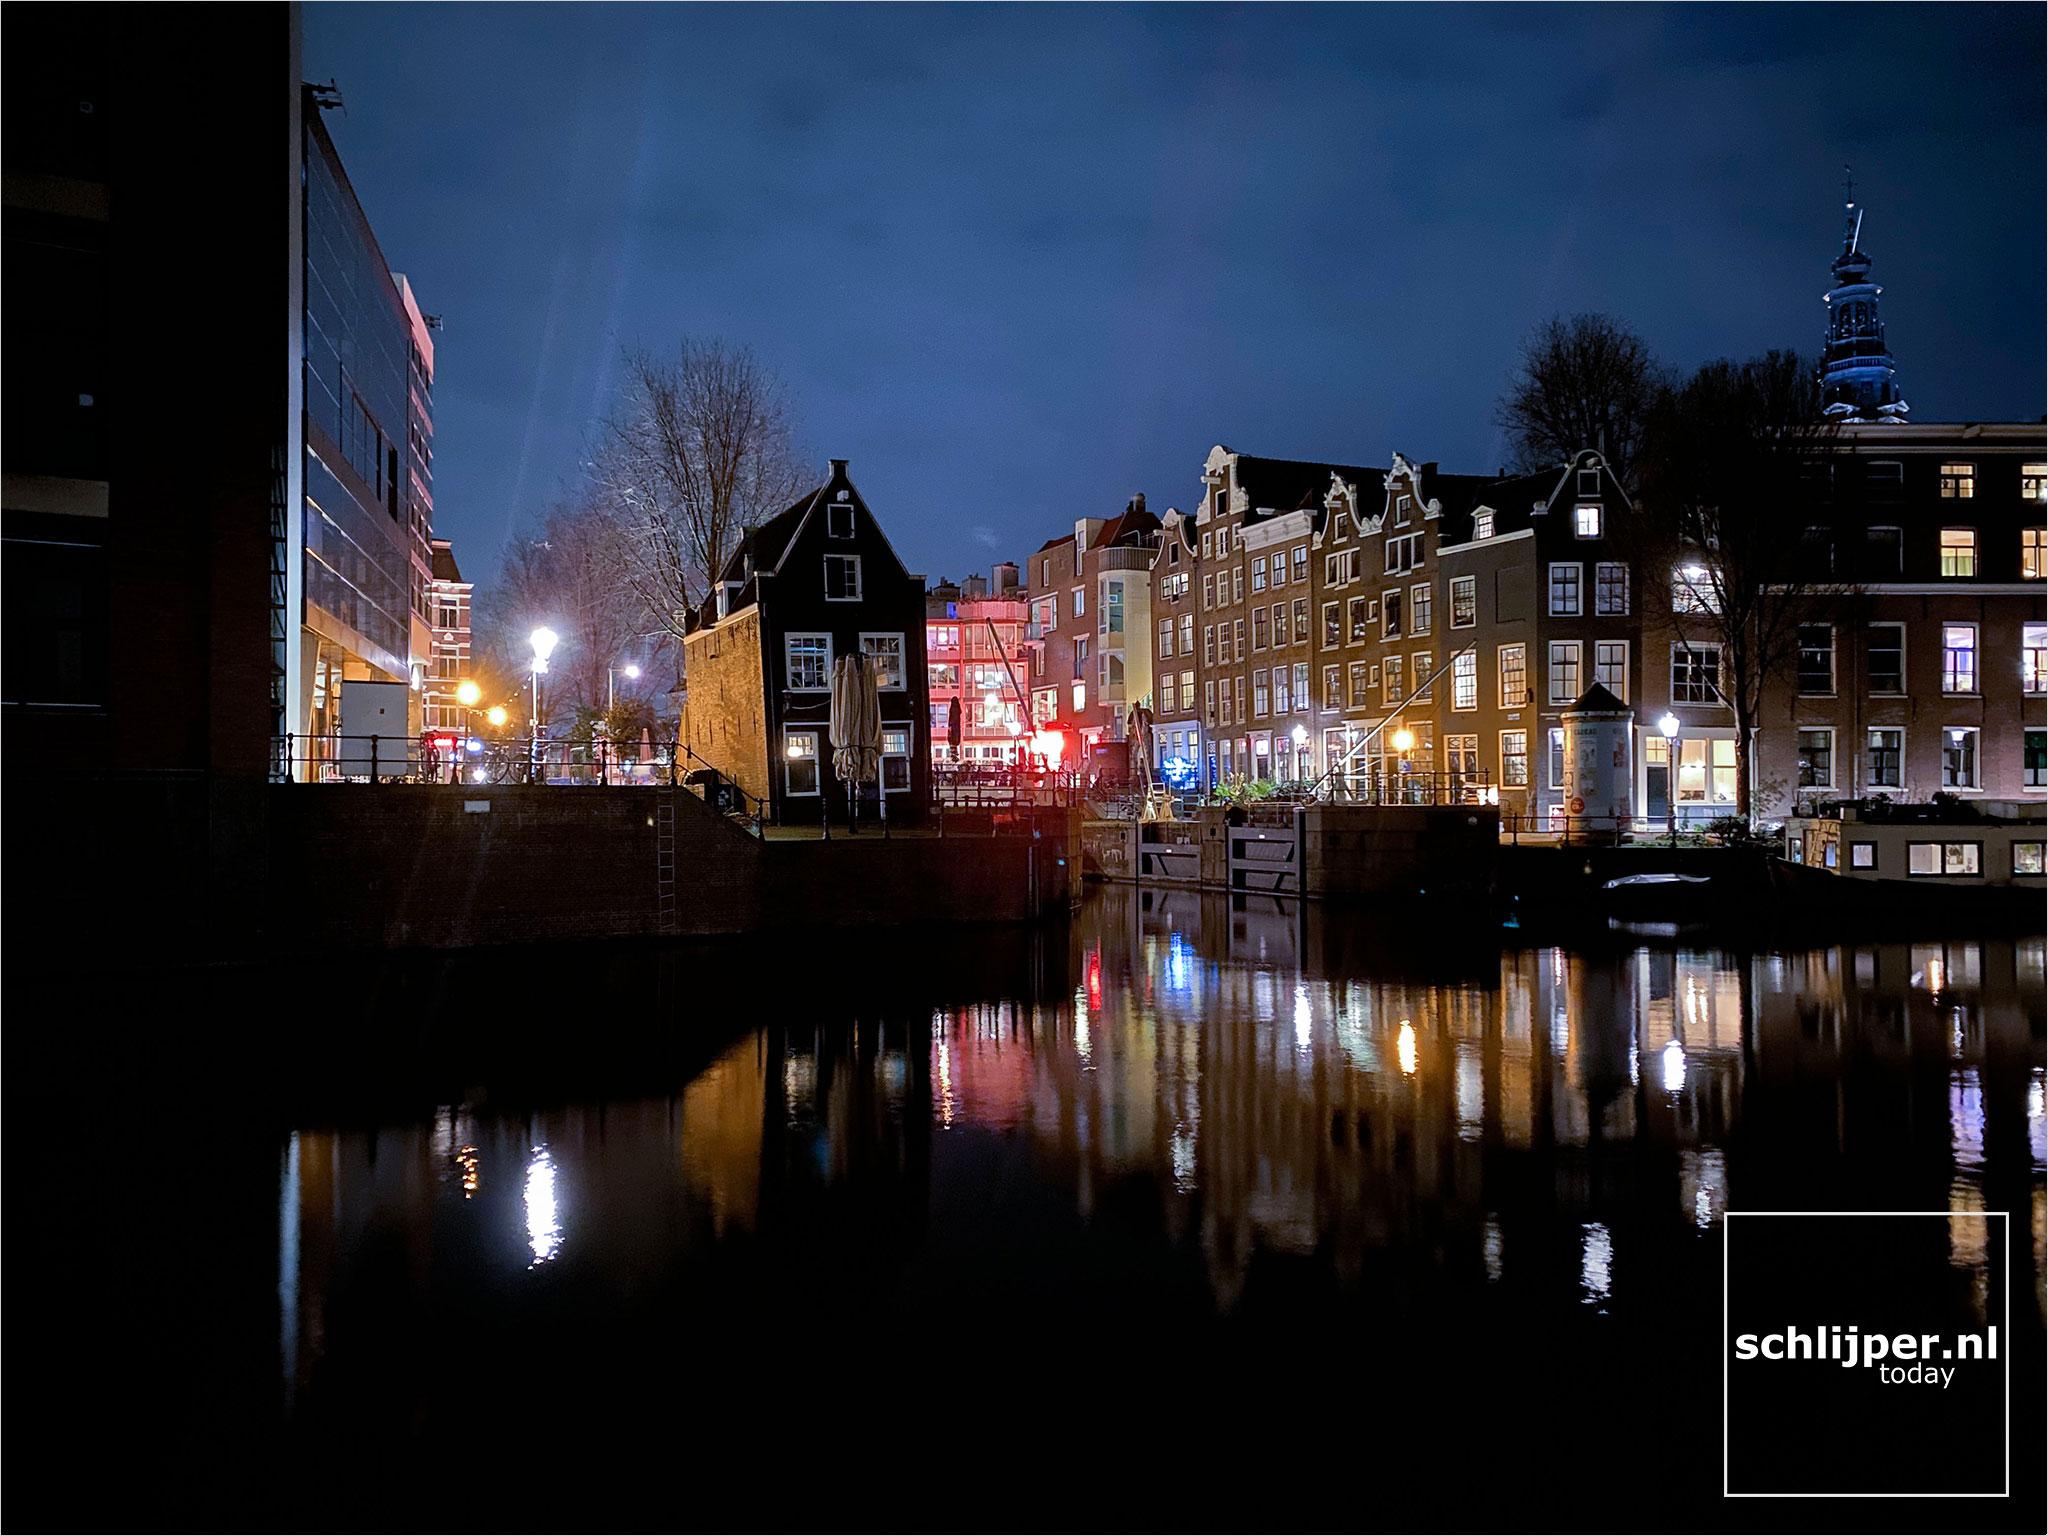 The Netherlands, Amsterdam, 13 januari 2021